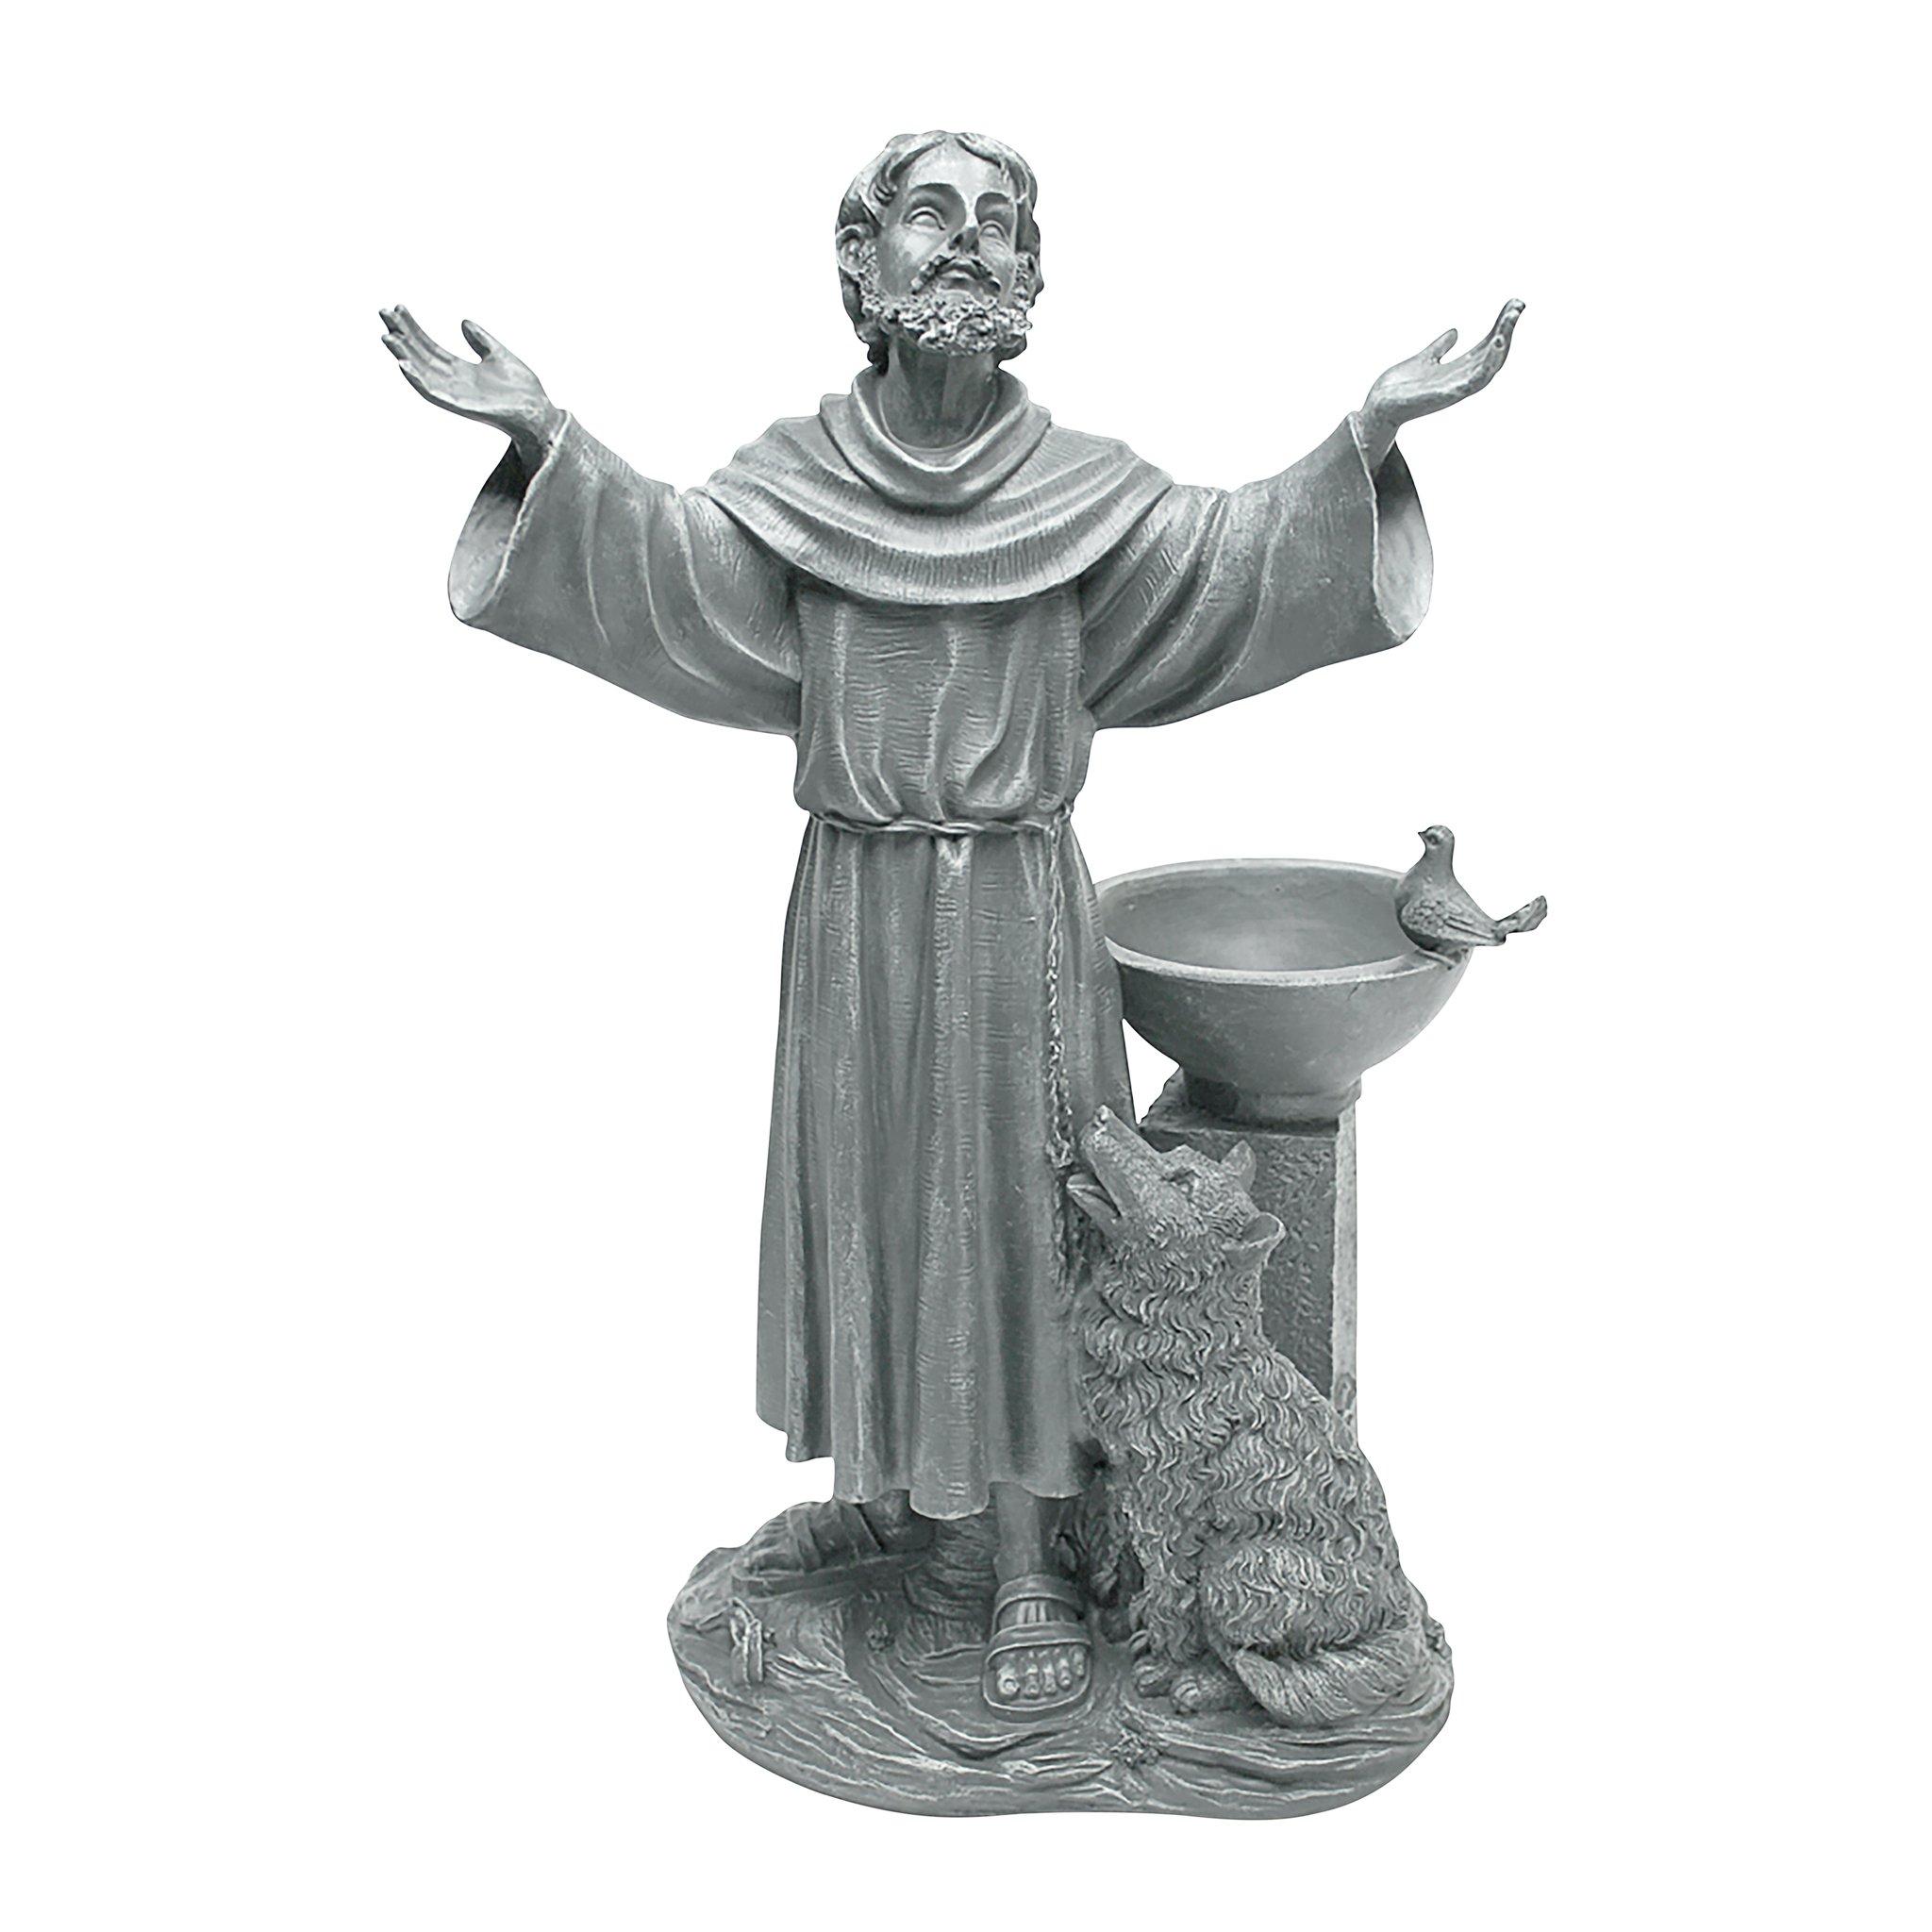 Design Toscano JE14106 St. Francis' Blessing Religious Garden Decor Statue Bath Bird Feeder, 19 Inch Greystone